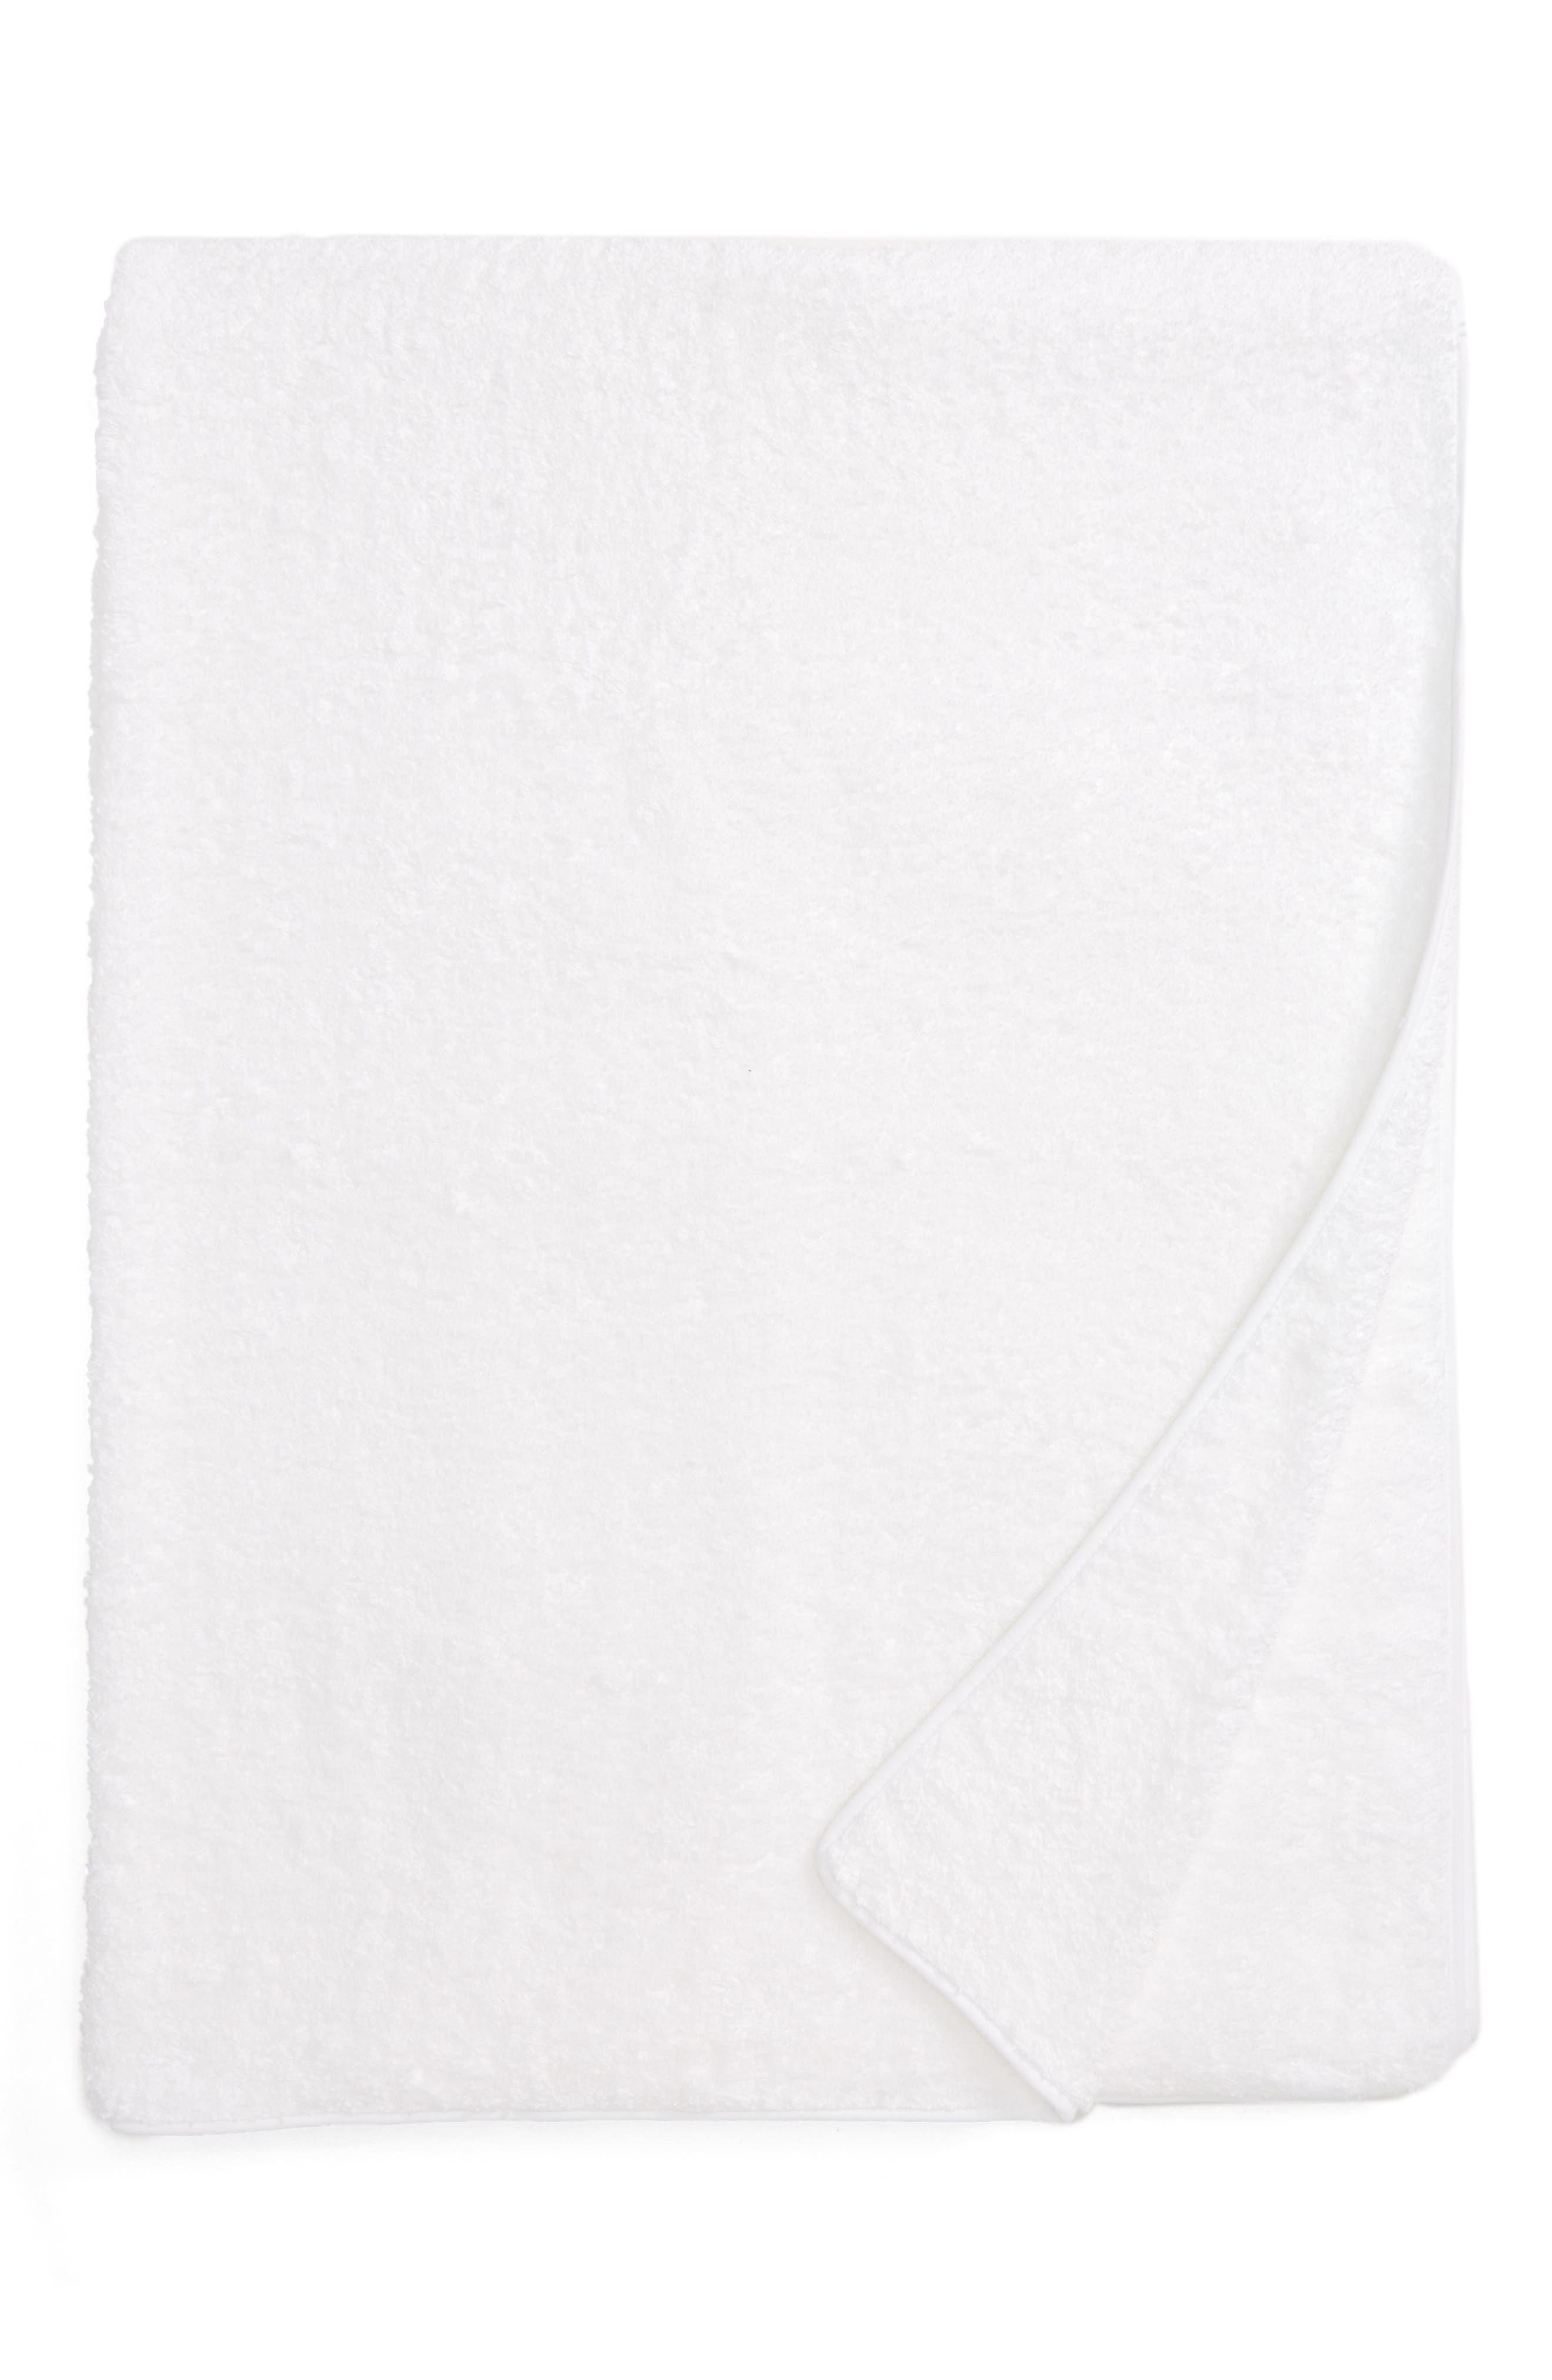 Cairo Bath Sheet,                         Main,                         color, White